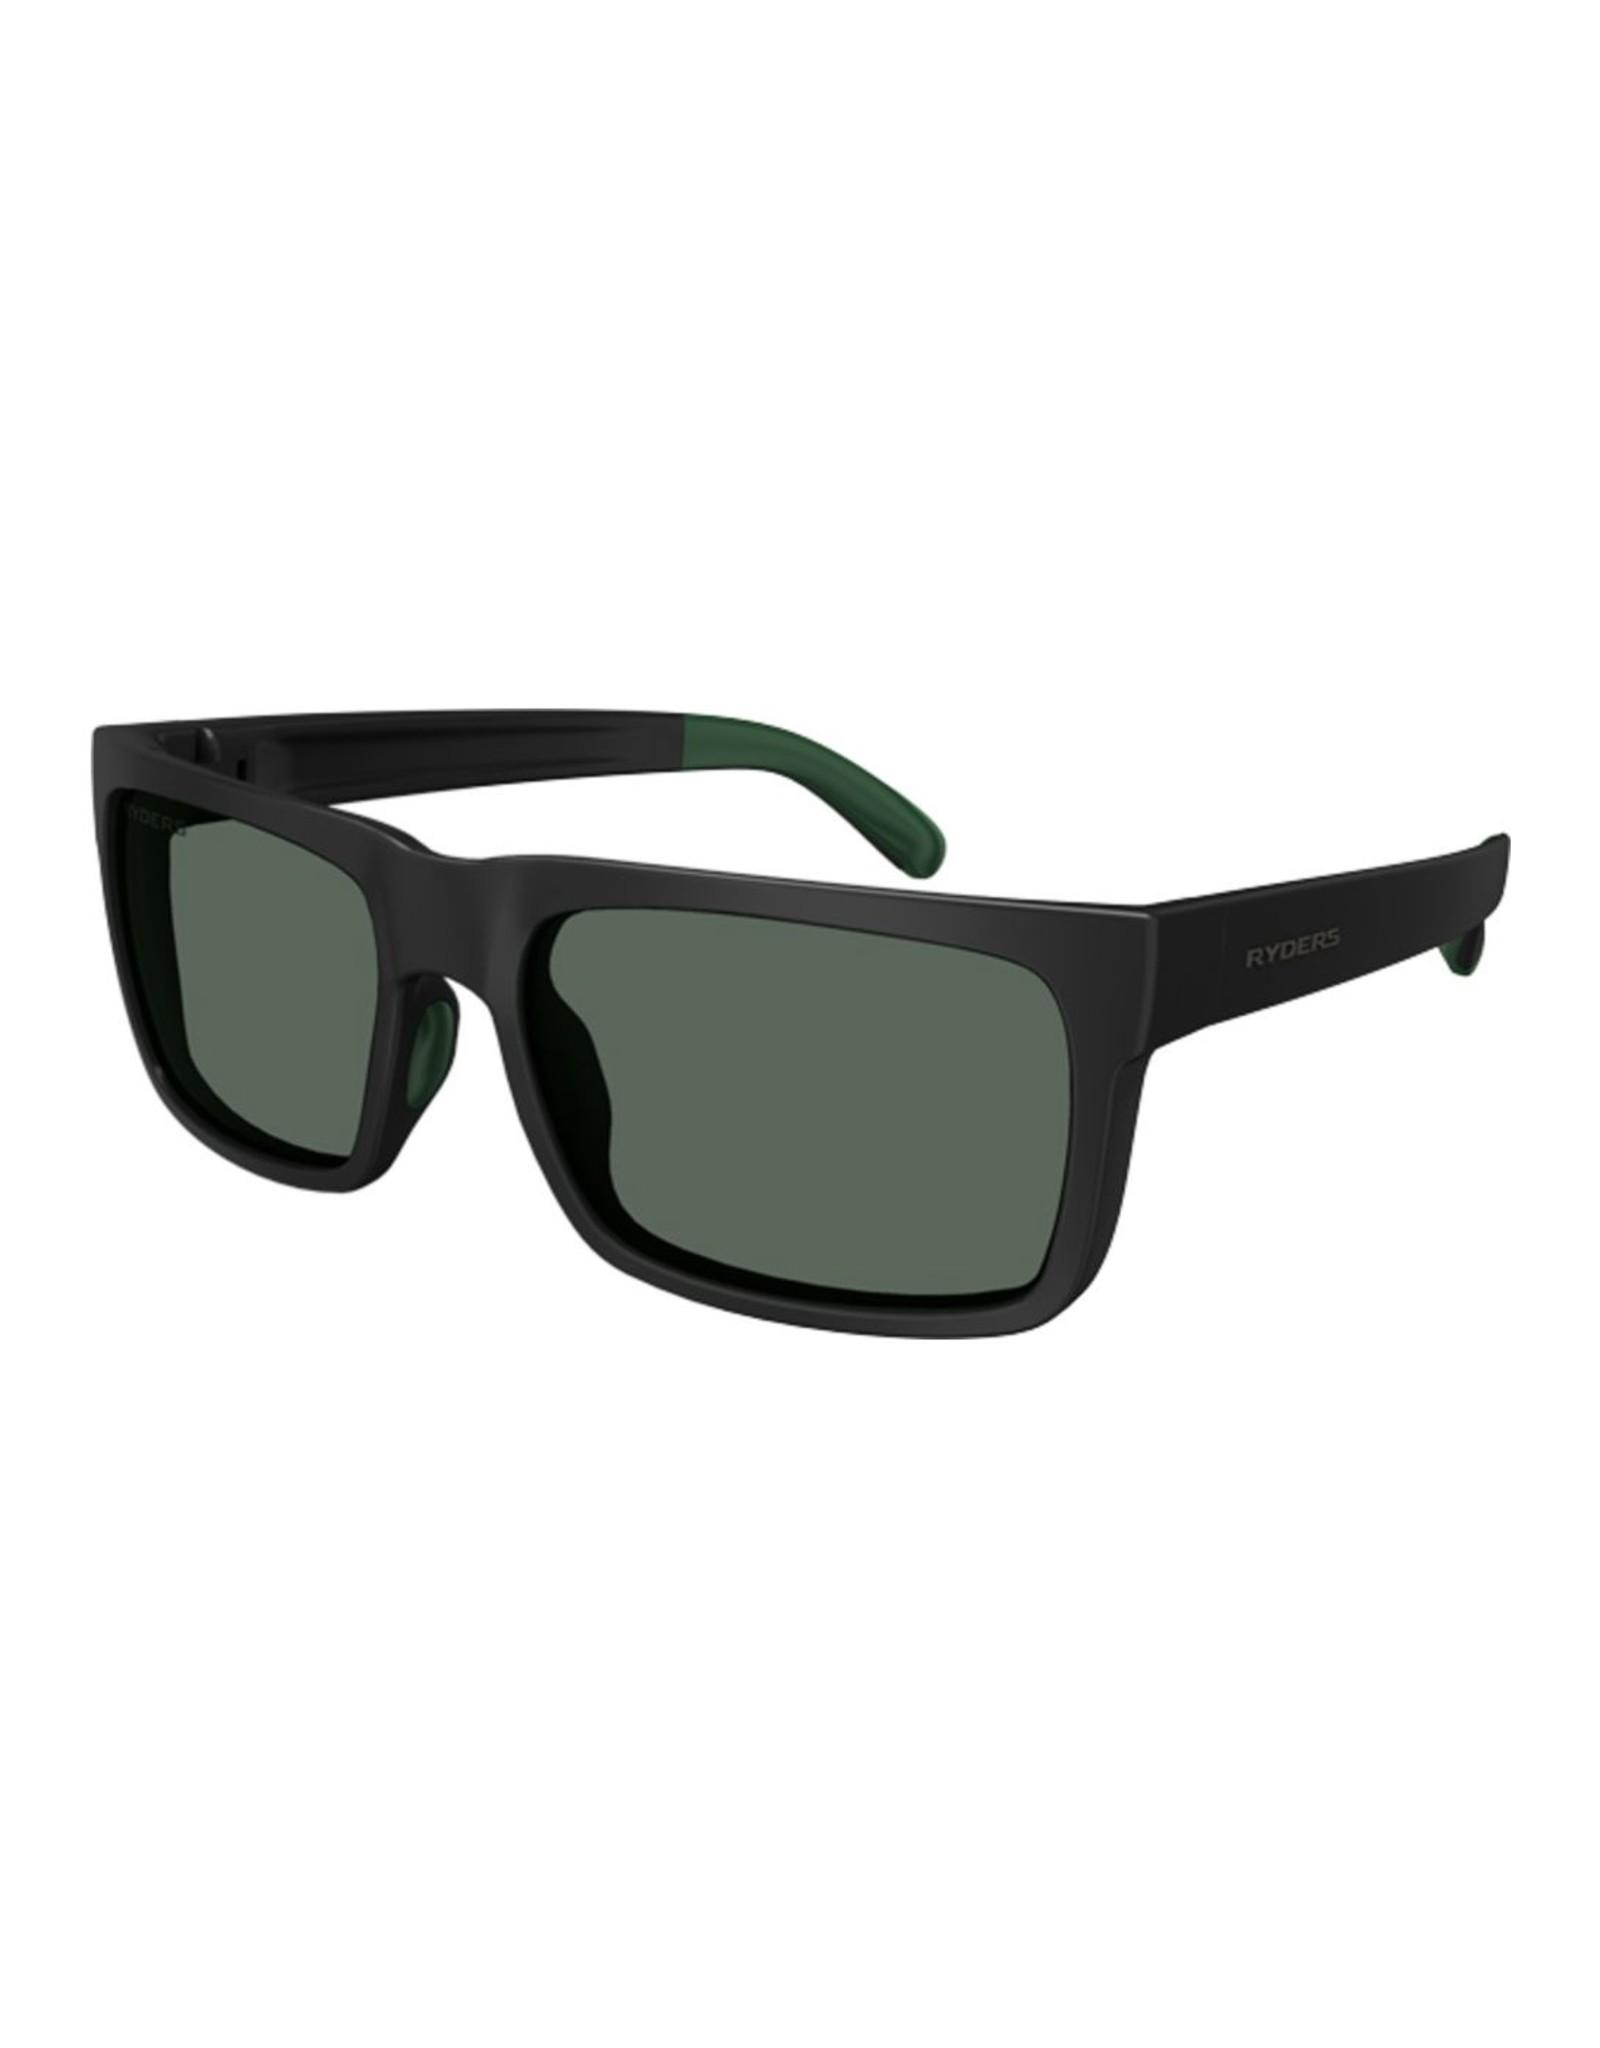 Ryders Eyewear - Pemby CB Matte Black-Green/Green Lens AR